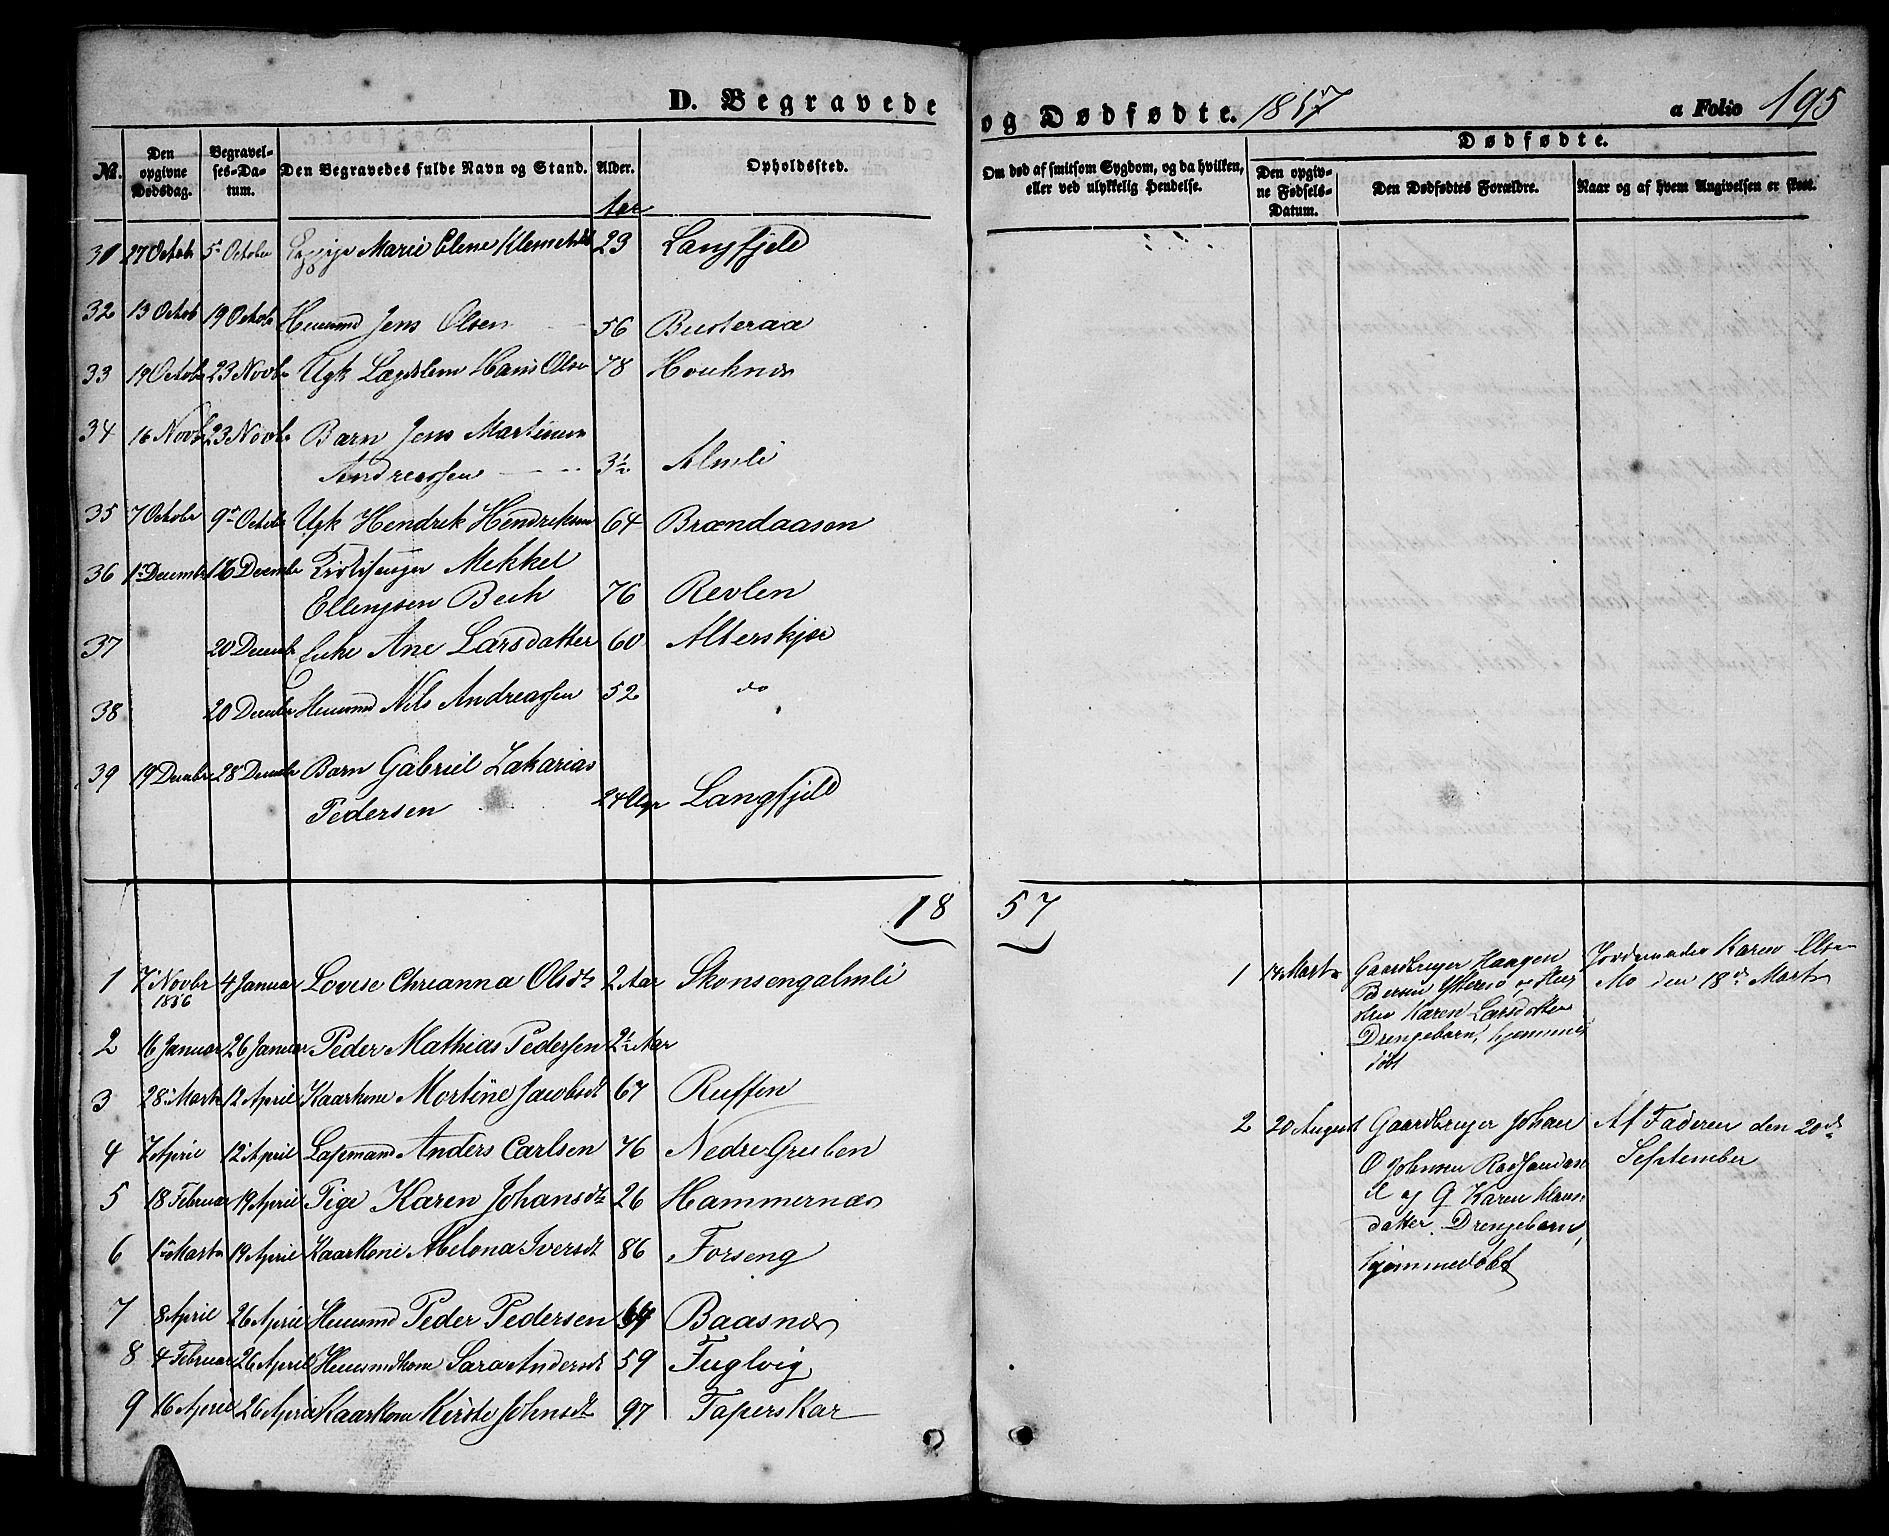 SAT, Ministerialprotokoller, klokkerbøker og fødselsregistre - Nordland, 827/L0414: Klokkerbok nr. 827C03, 1853-1865, s. 195